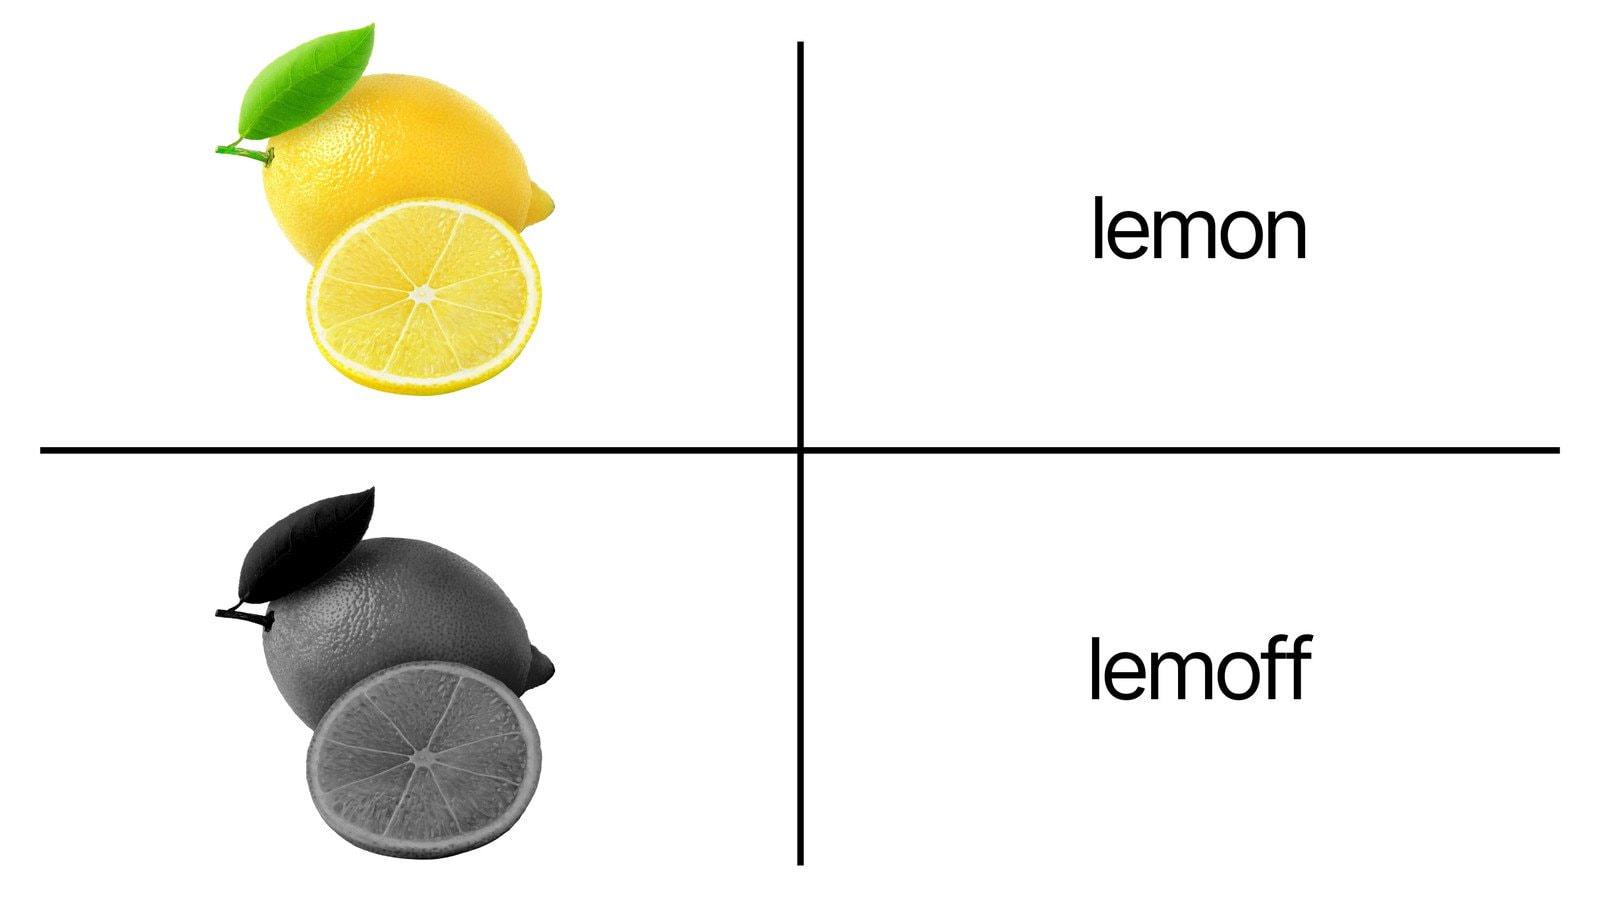 Meme Gambar Dua Teks Sederhana Putih dan Lemon